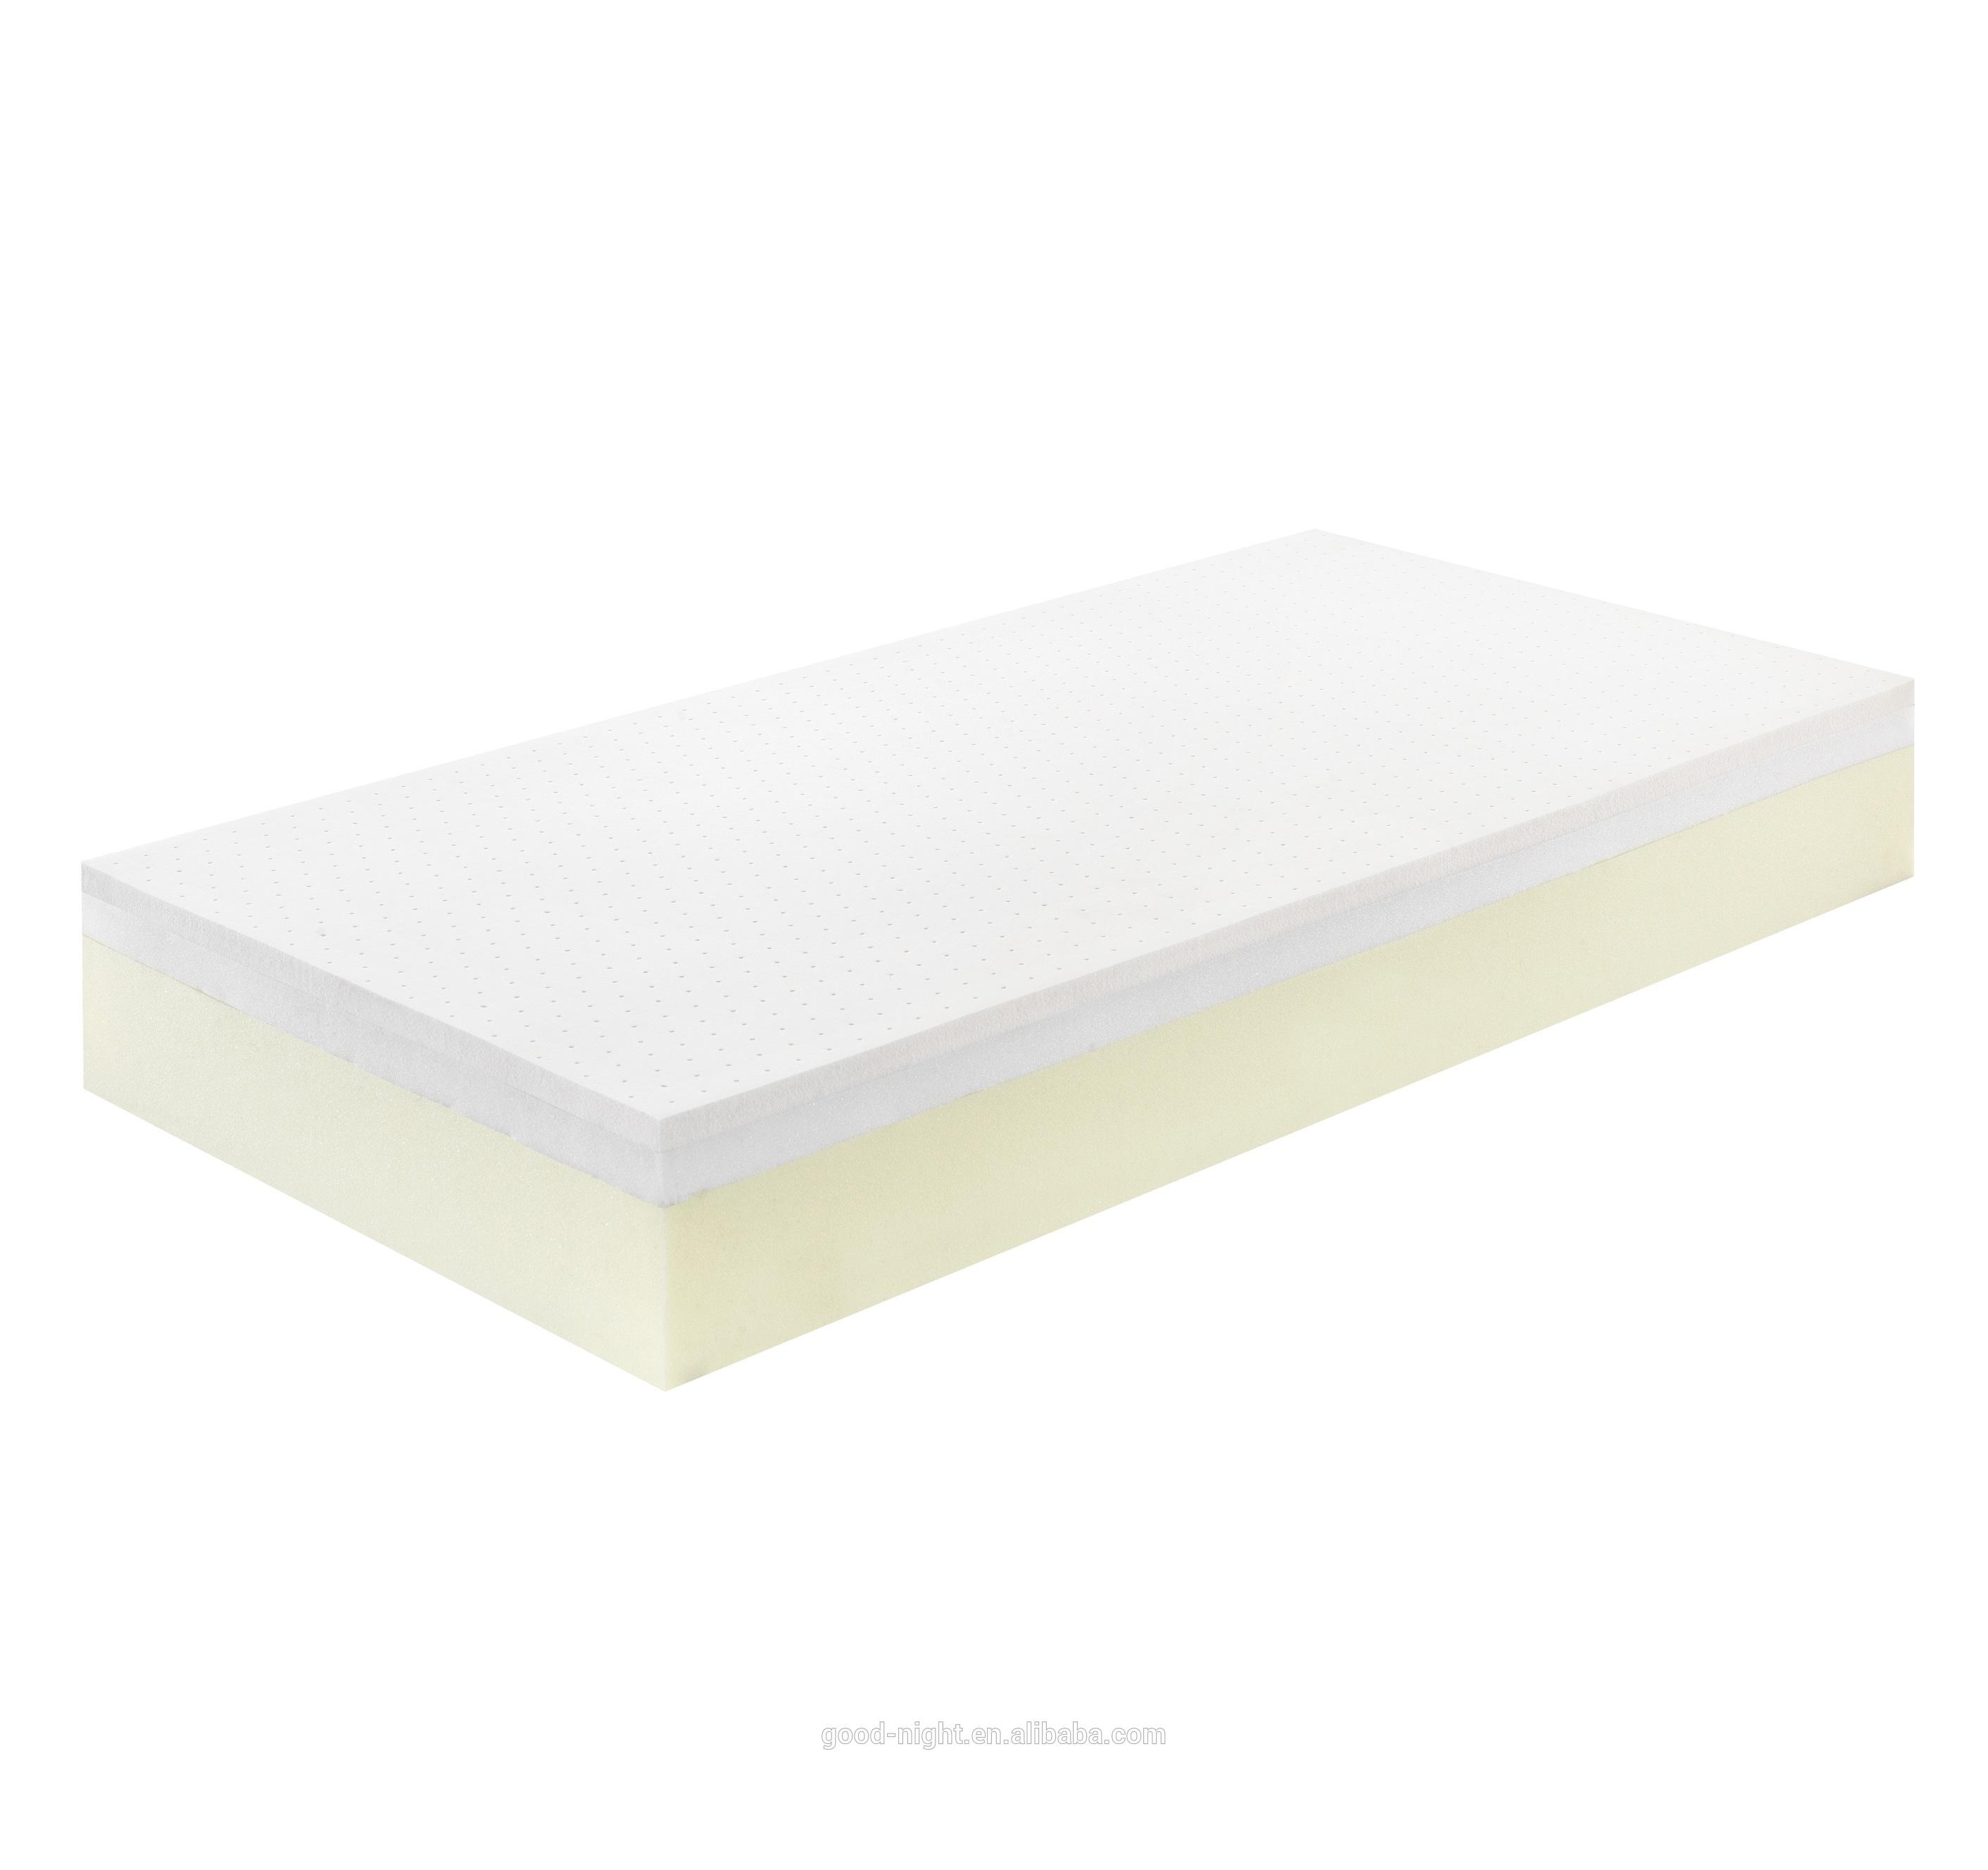 Vacuum Pack Rubber Royal Foam 3d Natural Latex Hybrid Mattress - Jozy Mattress | Jozy.net